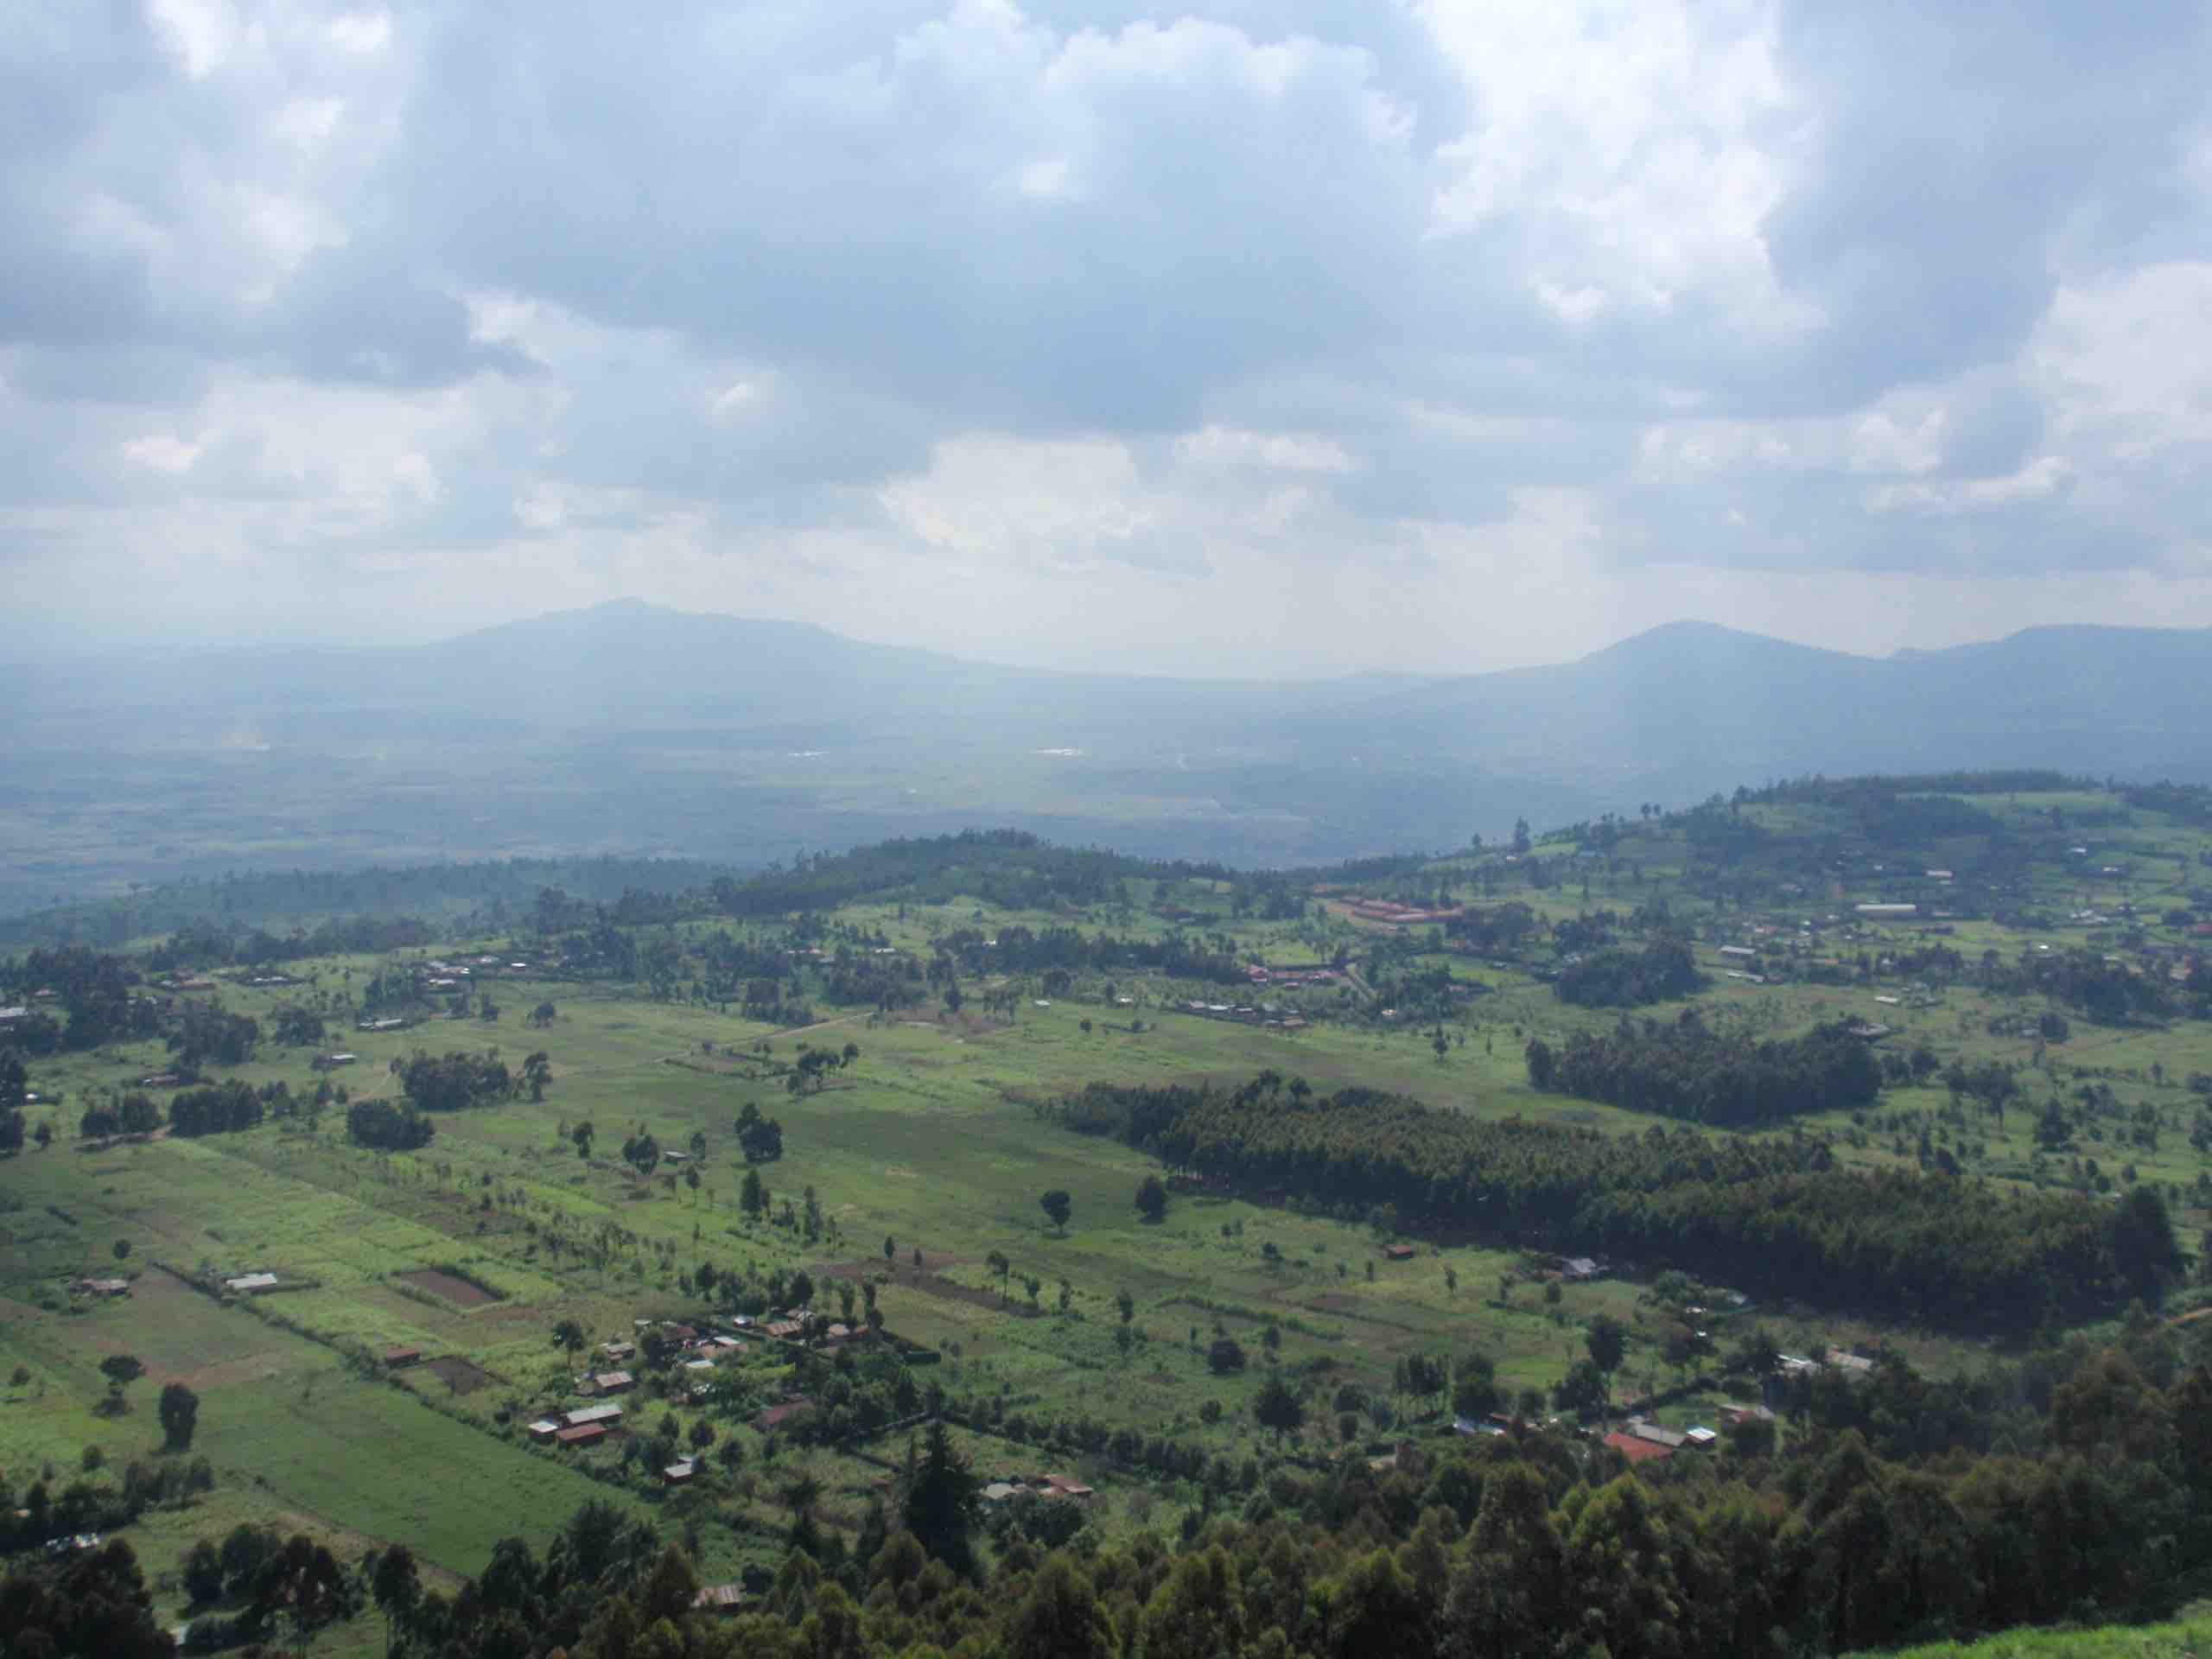 Kenya Scenery